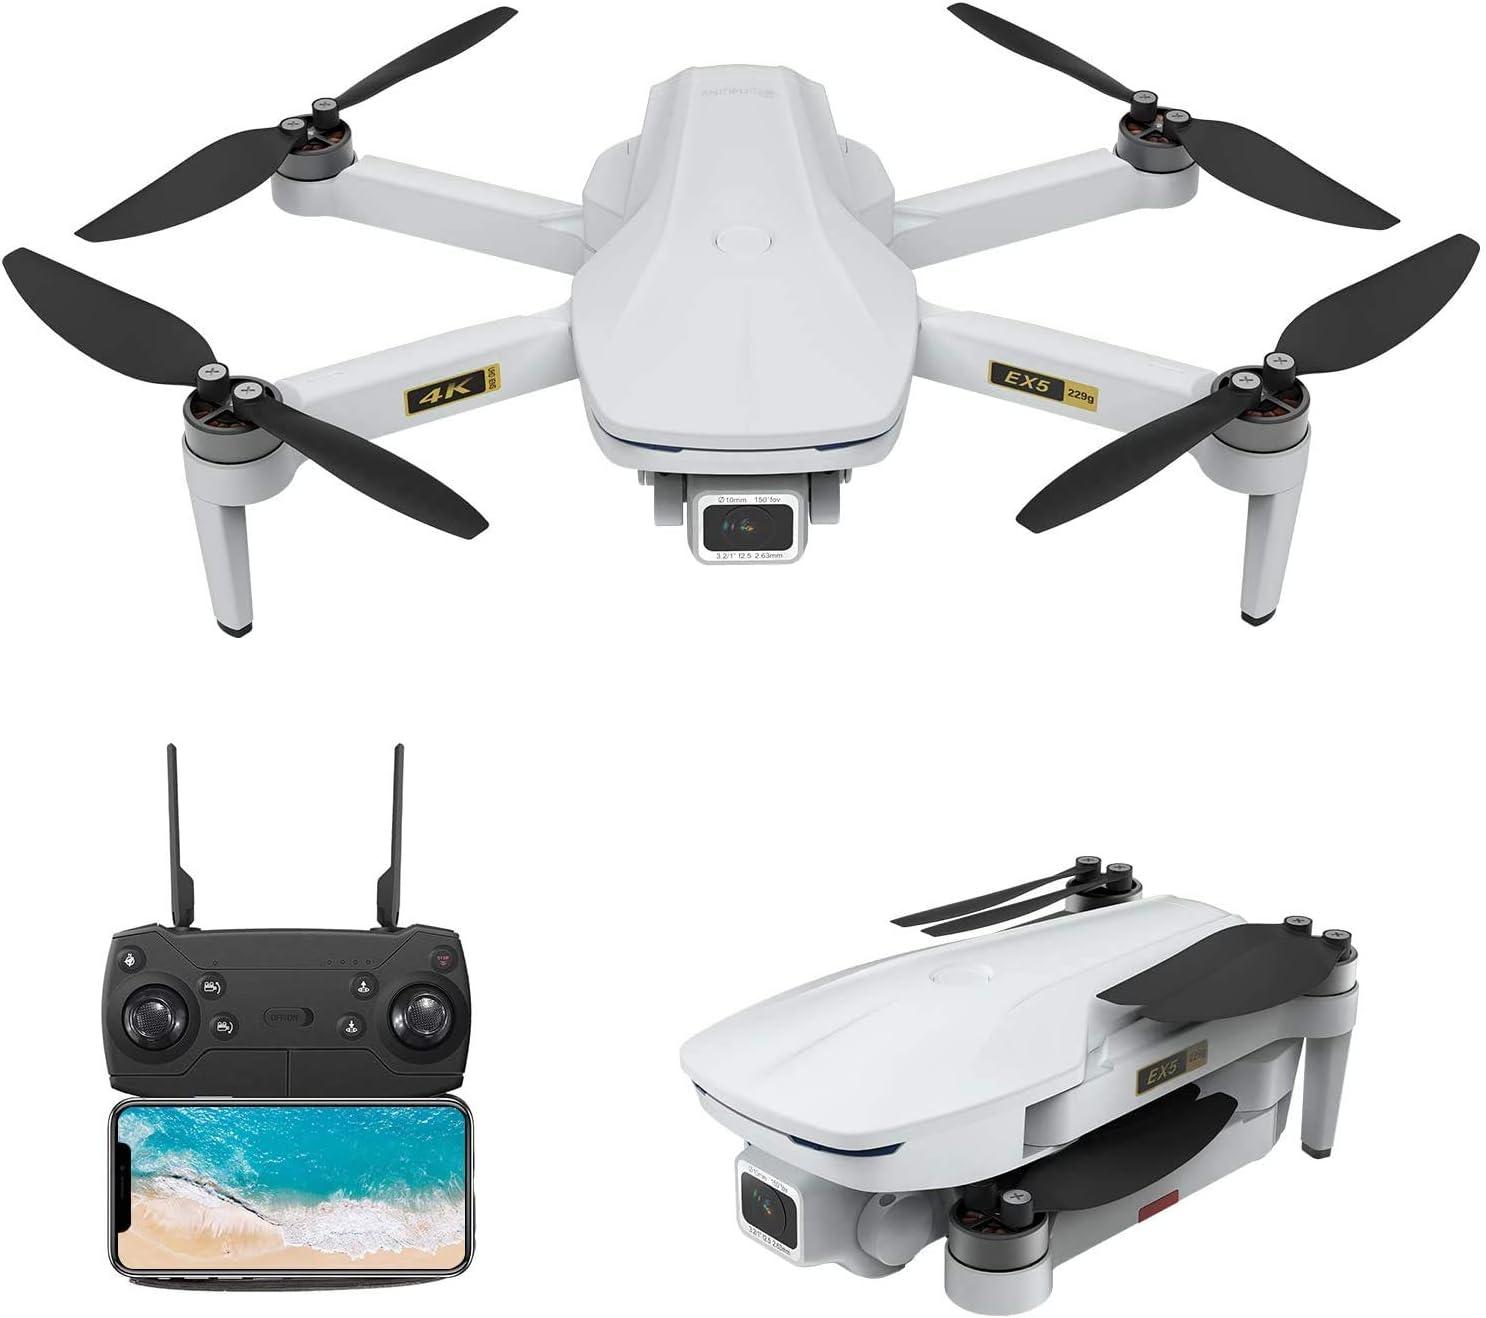 EACHINE EX5 GPS Mini Drone wif 4K UHD Camera for Adults 5G GHz WiFi FPV Floadbale Drones Quadcopter wif Brushless Motor 1000m Control Range, 30 Mins Flight Time,Auto Return Home, Follow Me